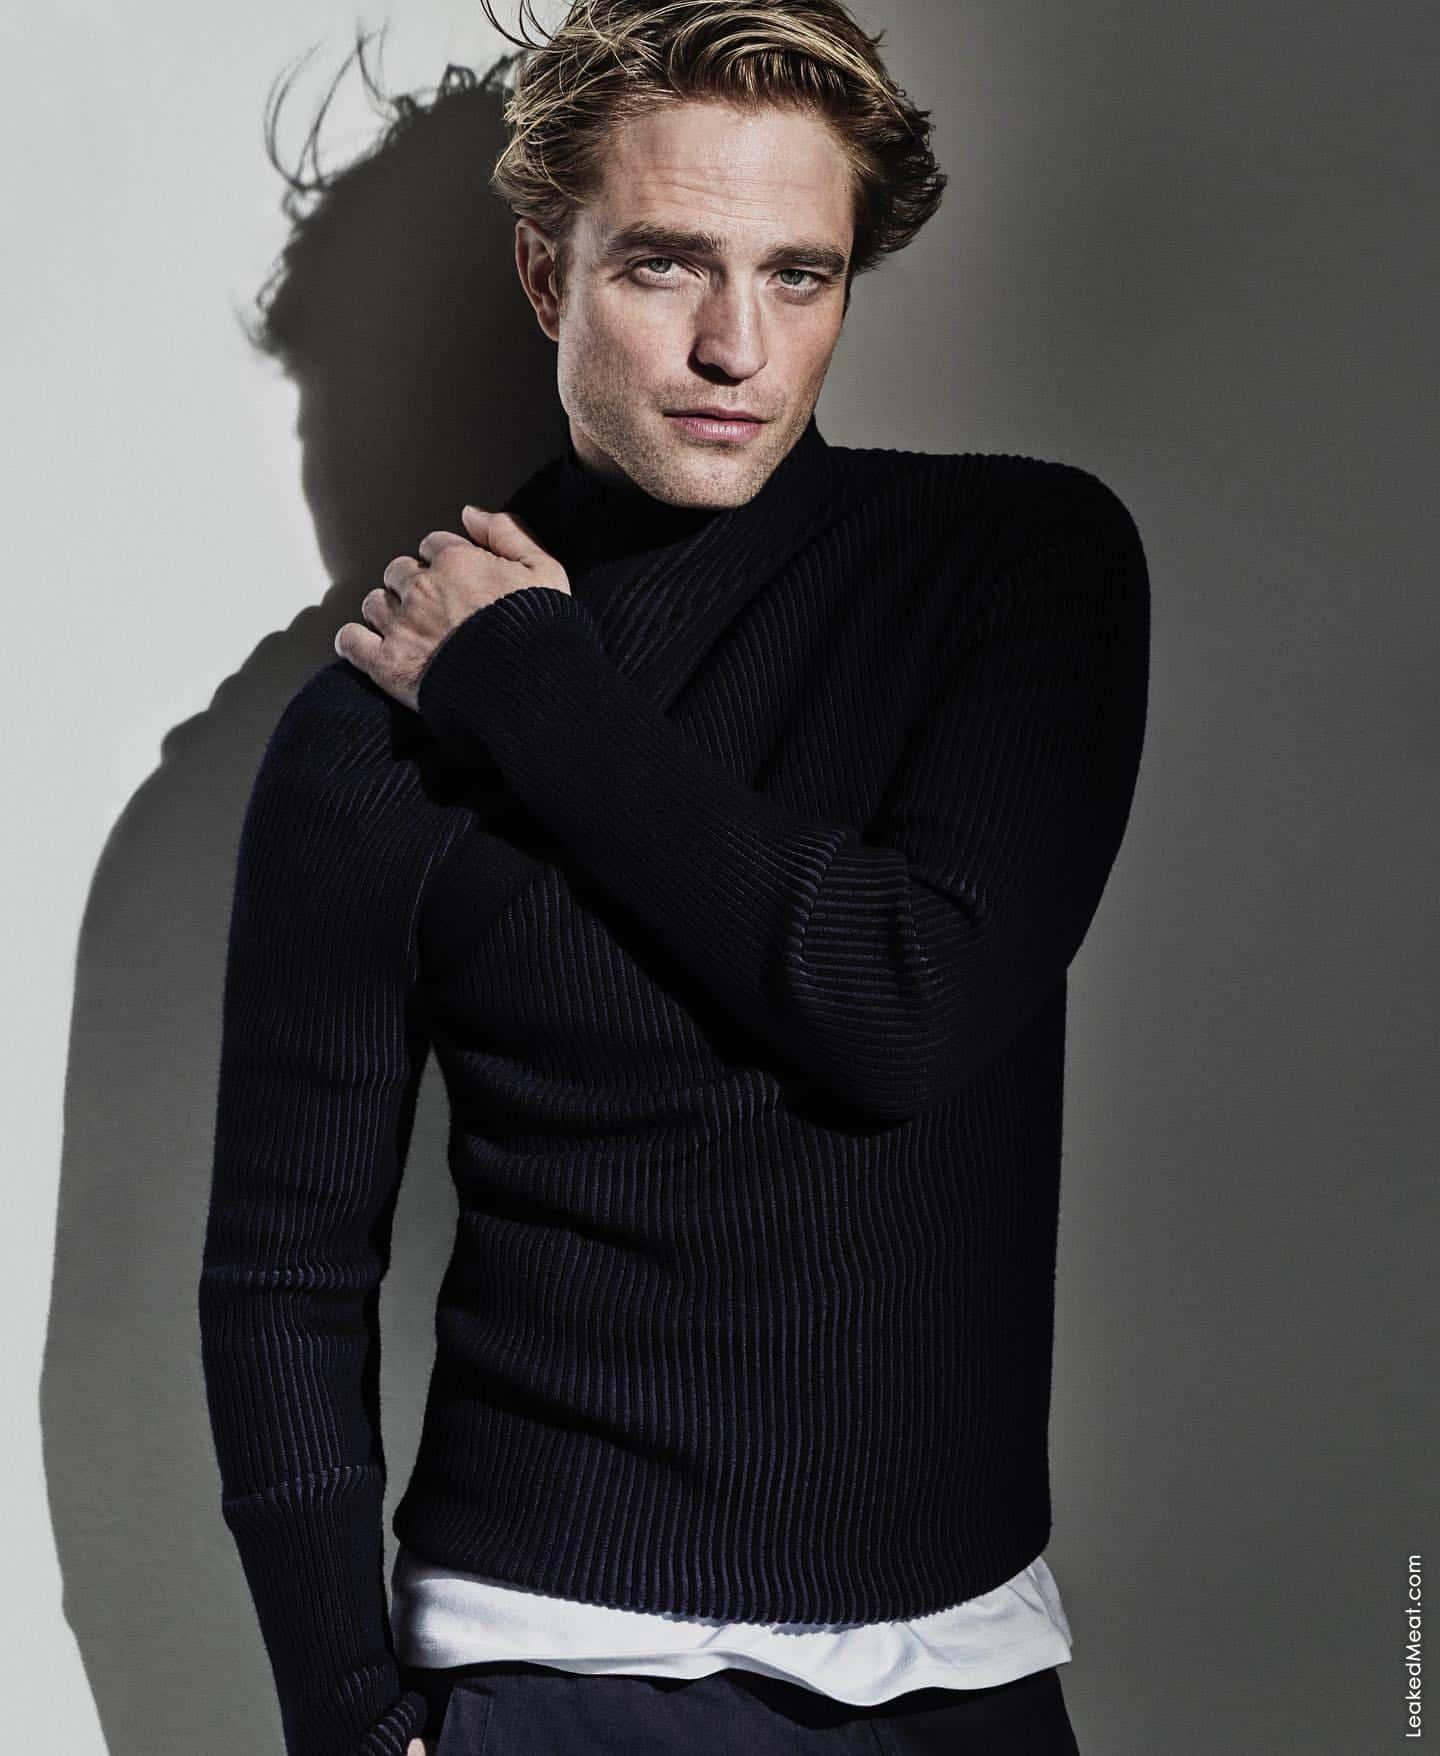 Robert Pattinson | LeakedMeat 12